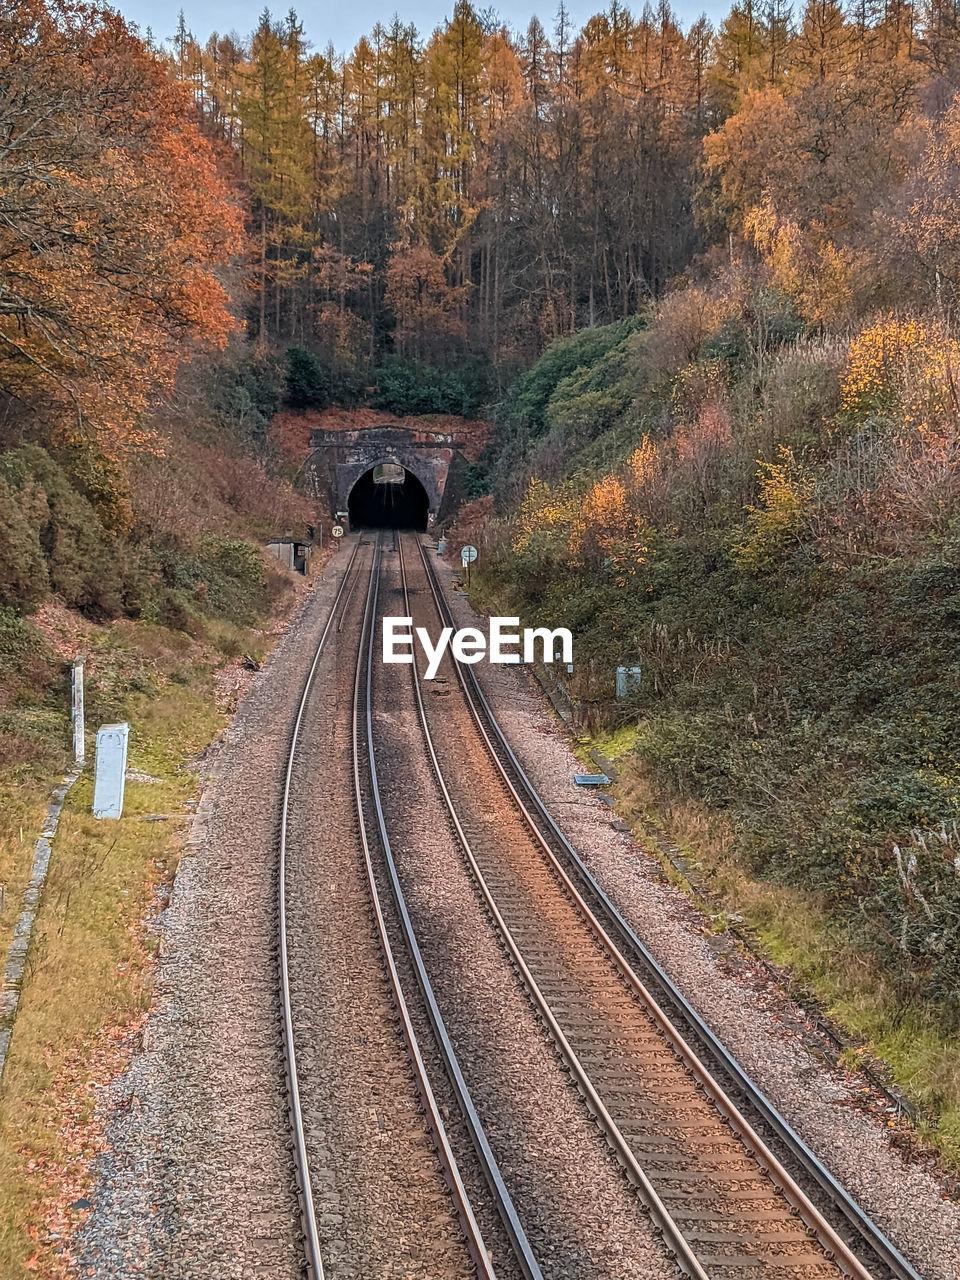 HIGH ANGLE VIEW OF RAILROAD TRACKS ALONG TREES